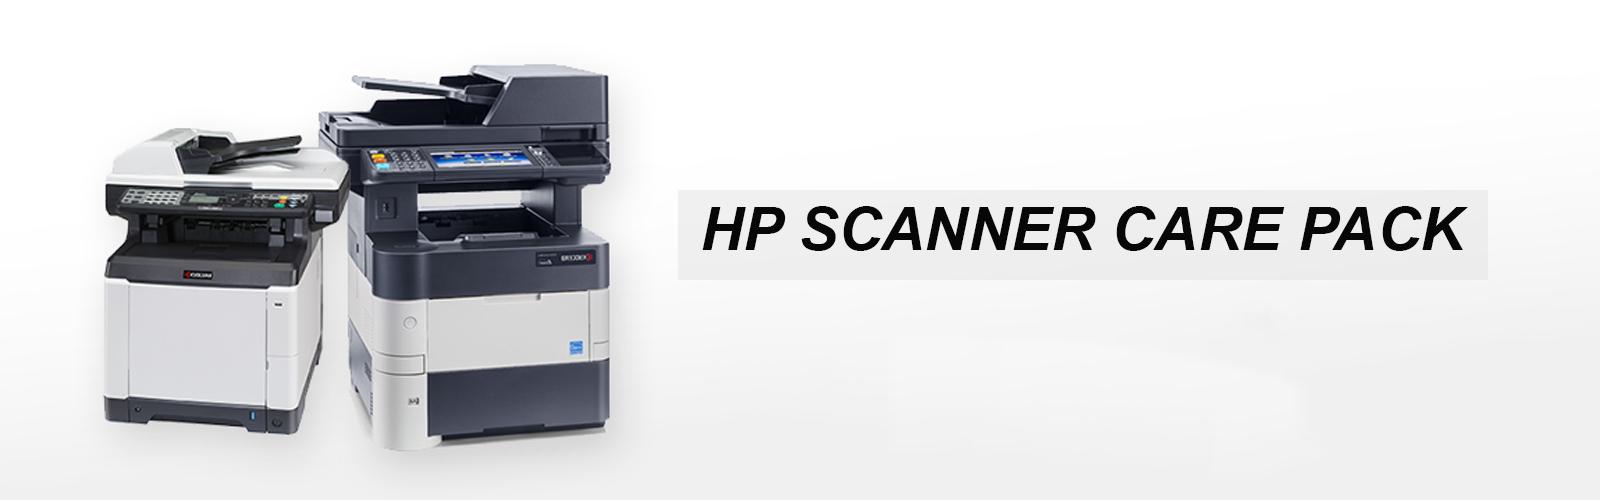 HP Scanner Care Pack Delhi